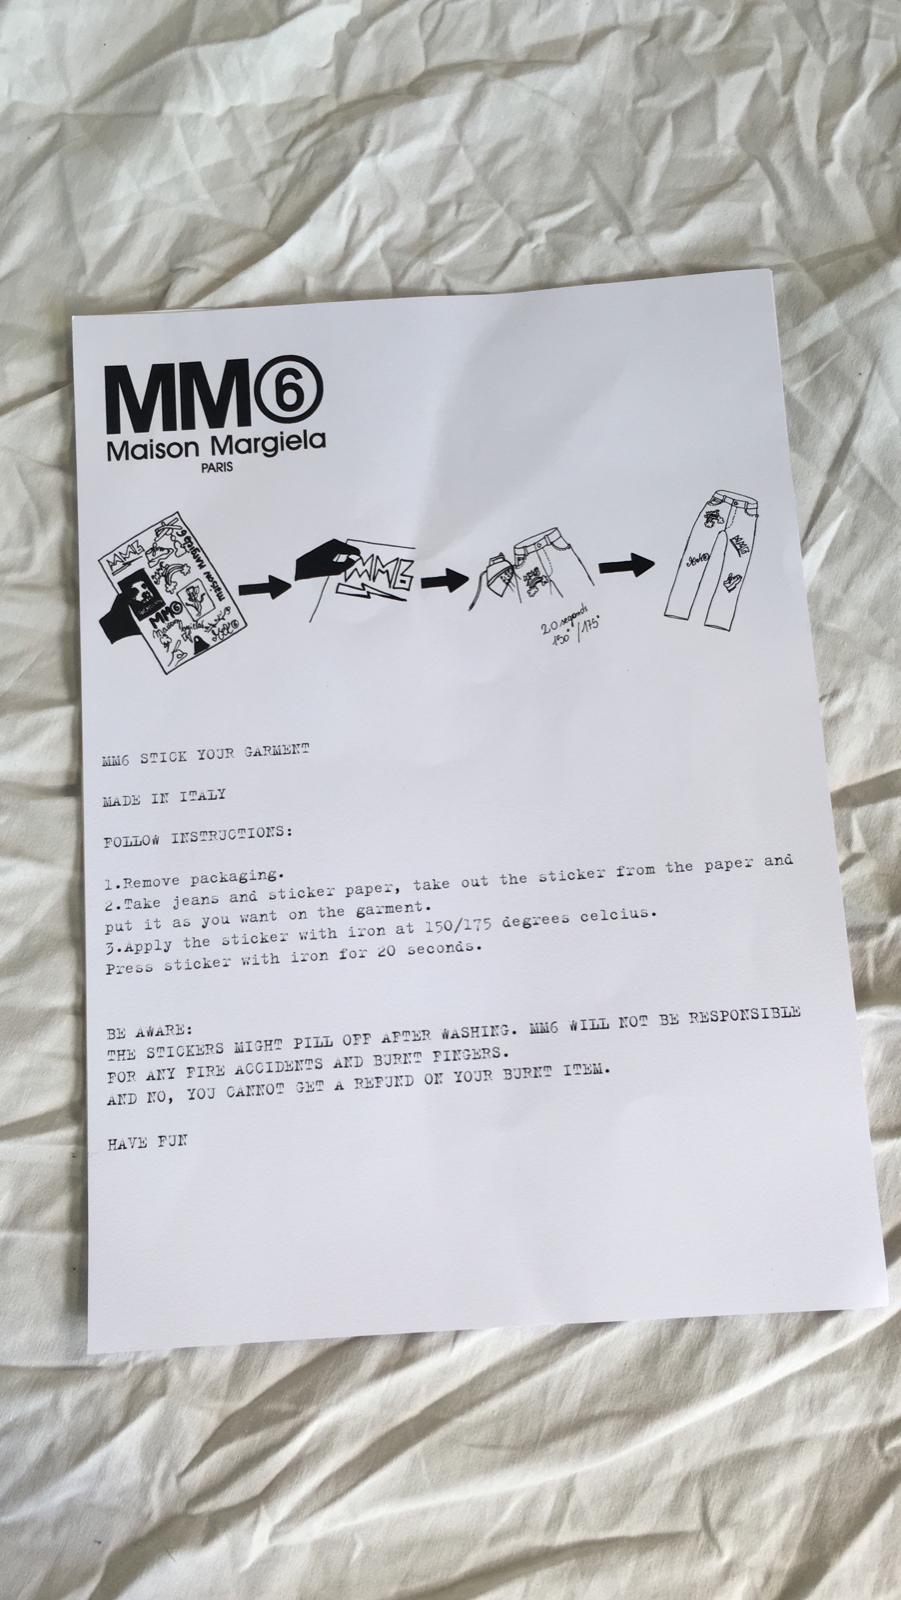 MM6.JPG